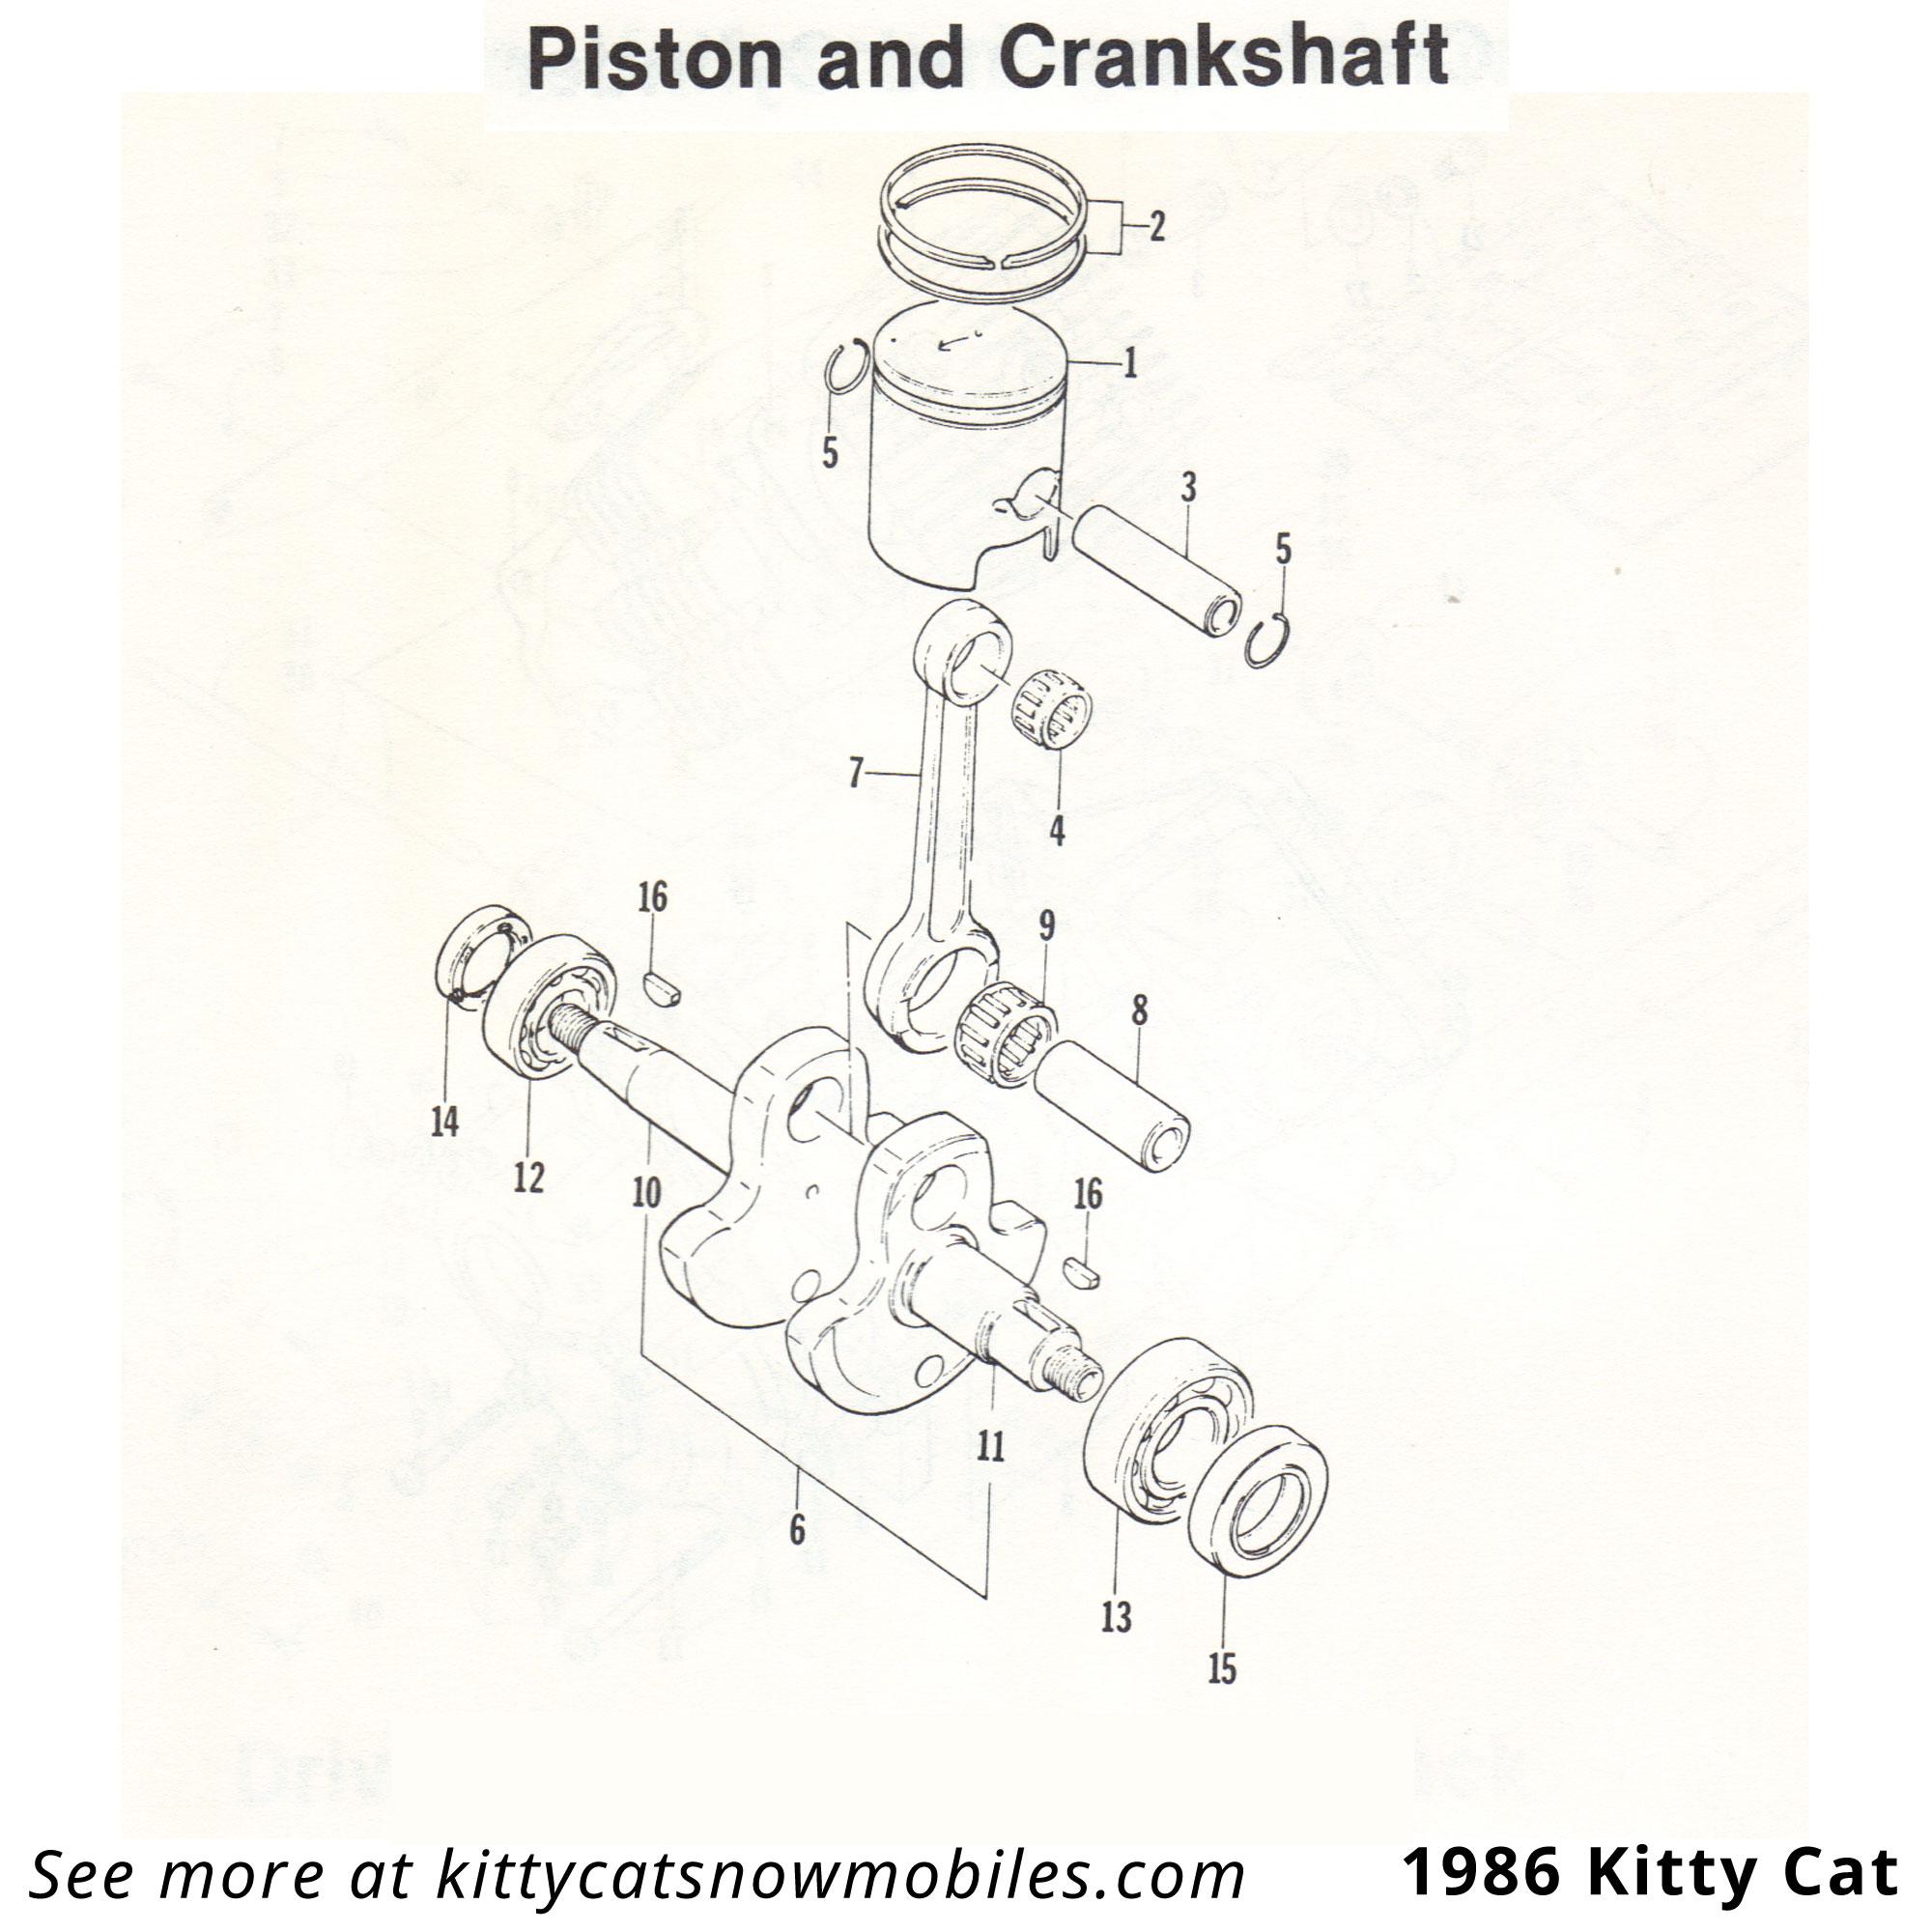 86 Kitty Cat Piston And Crankshaft Parts